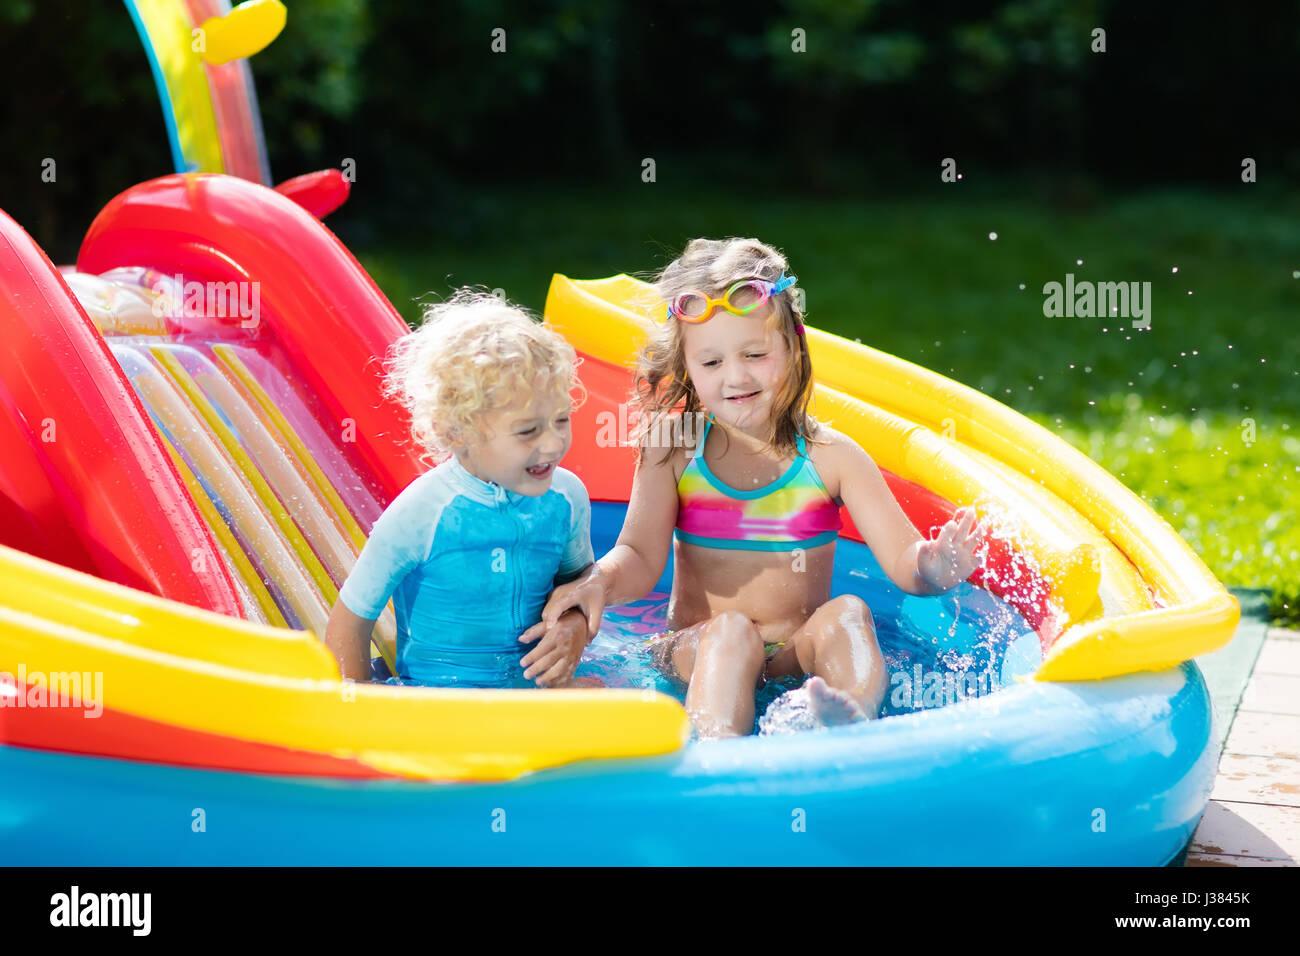 Water play garden children stock photos water play for Baby garden pool